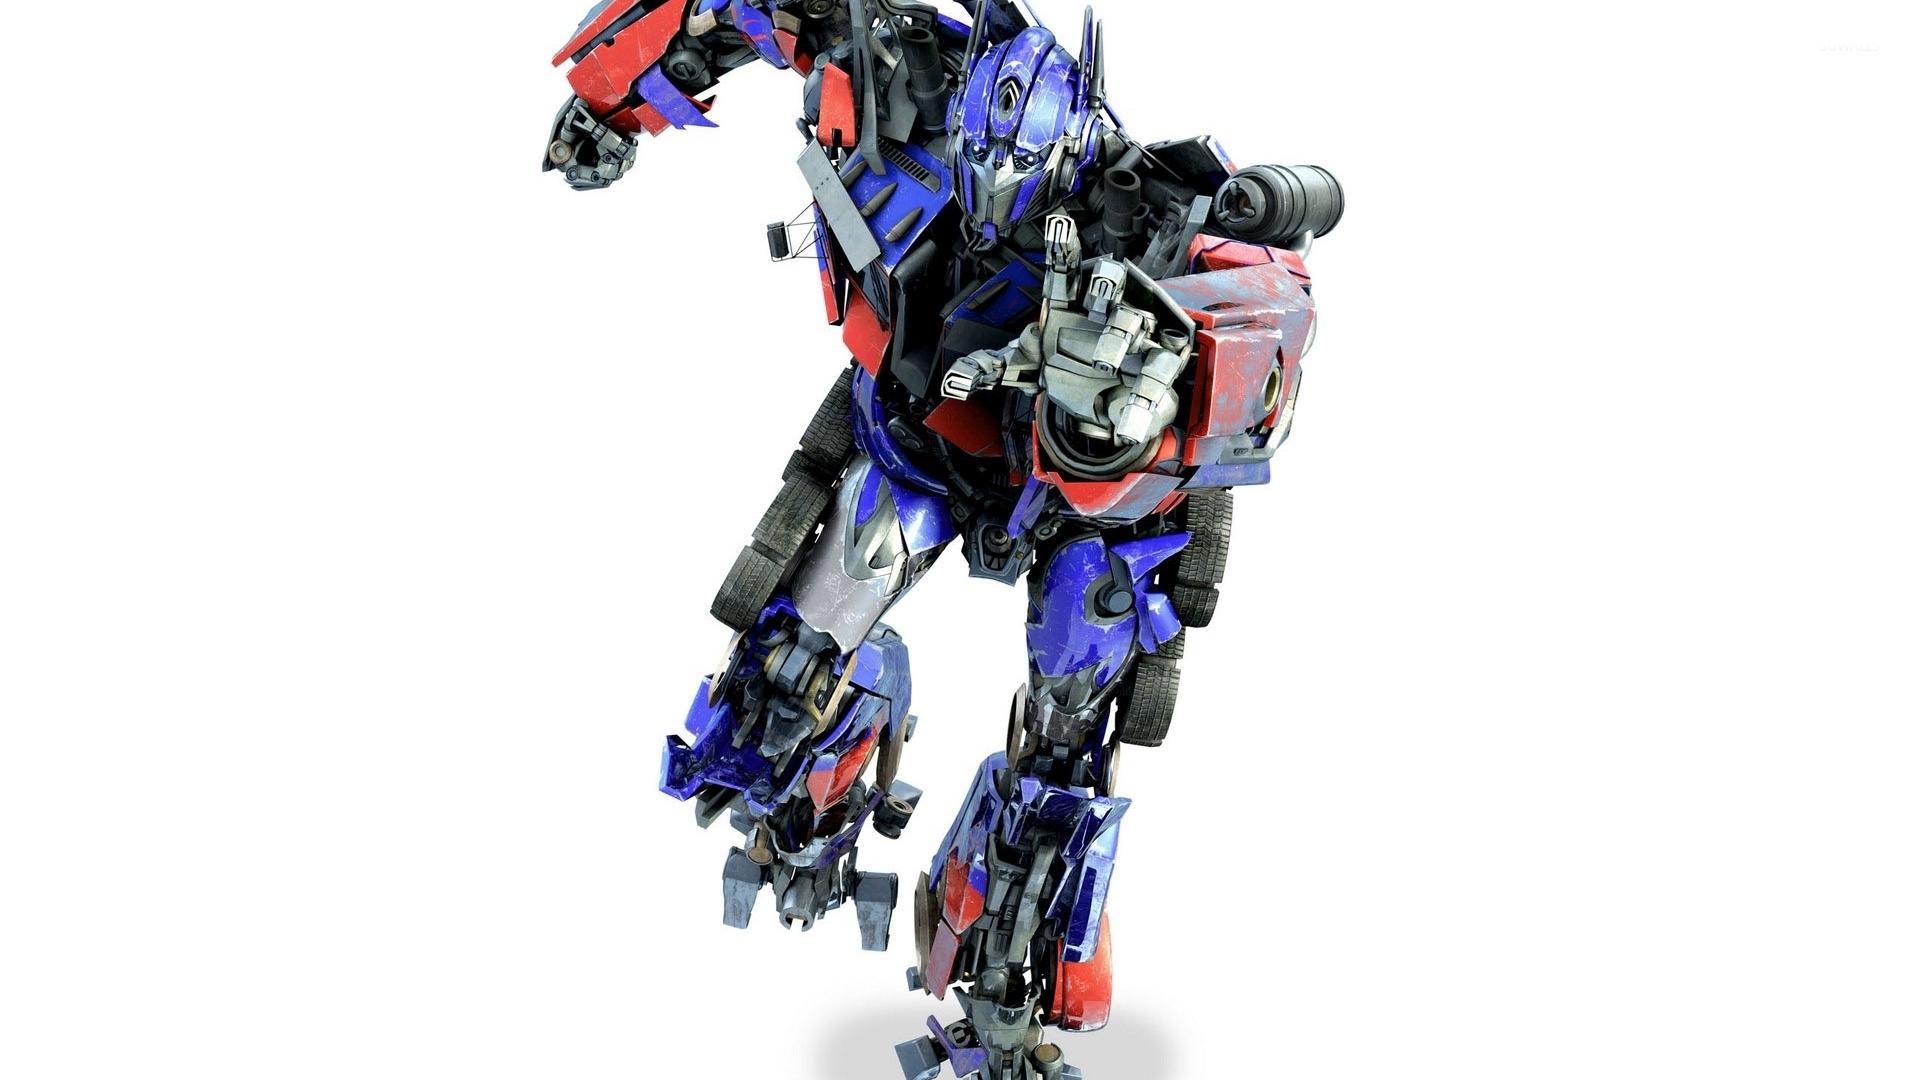 optimus prime transformers 7 wallpaper movie